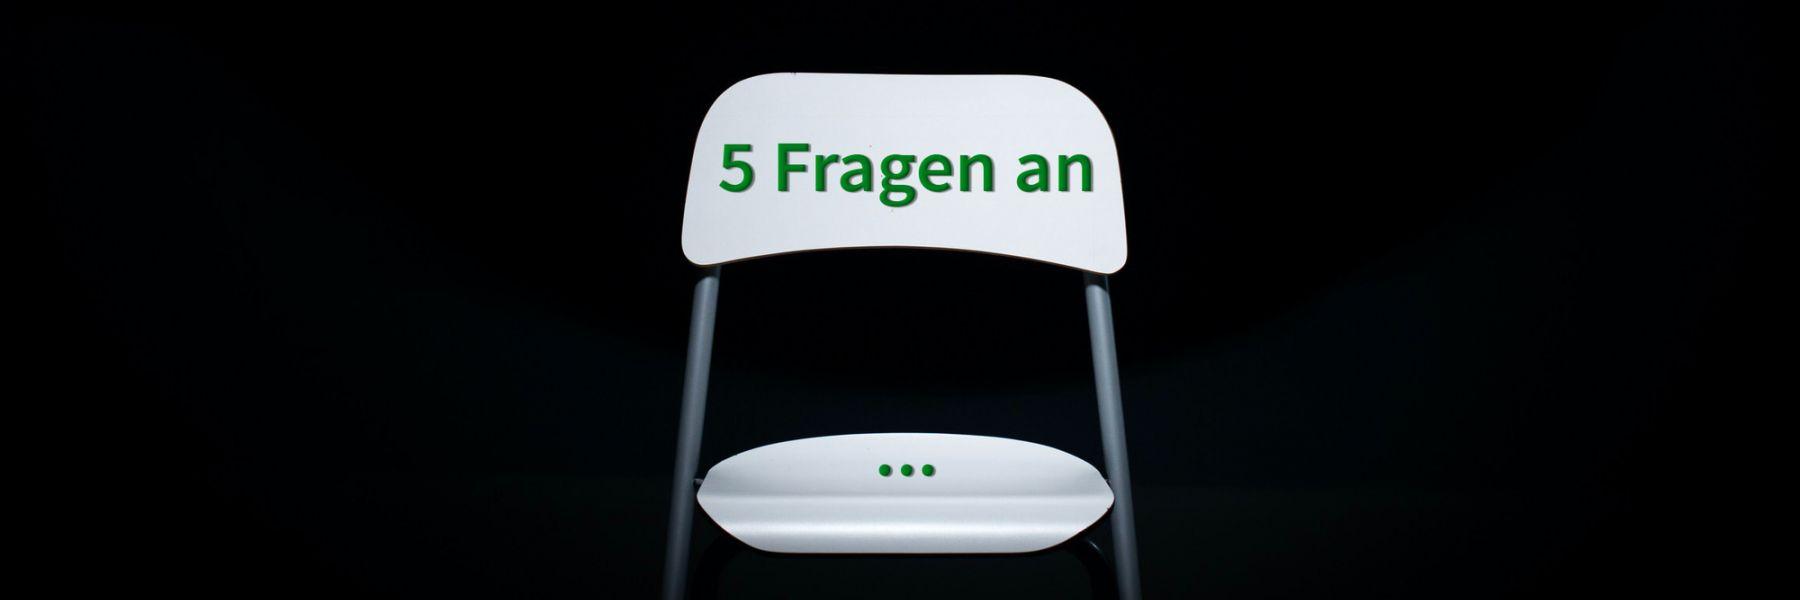 5 Fragen an : Christoph Woesler, Heidelberger Druckmaschinen AG